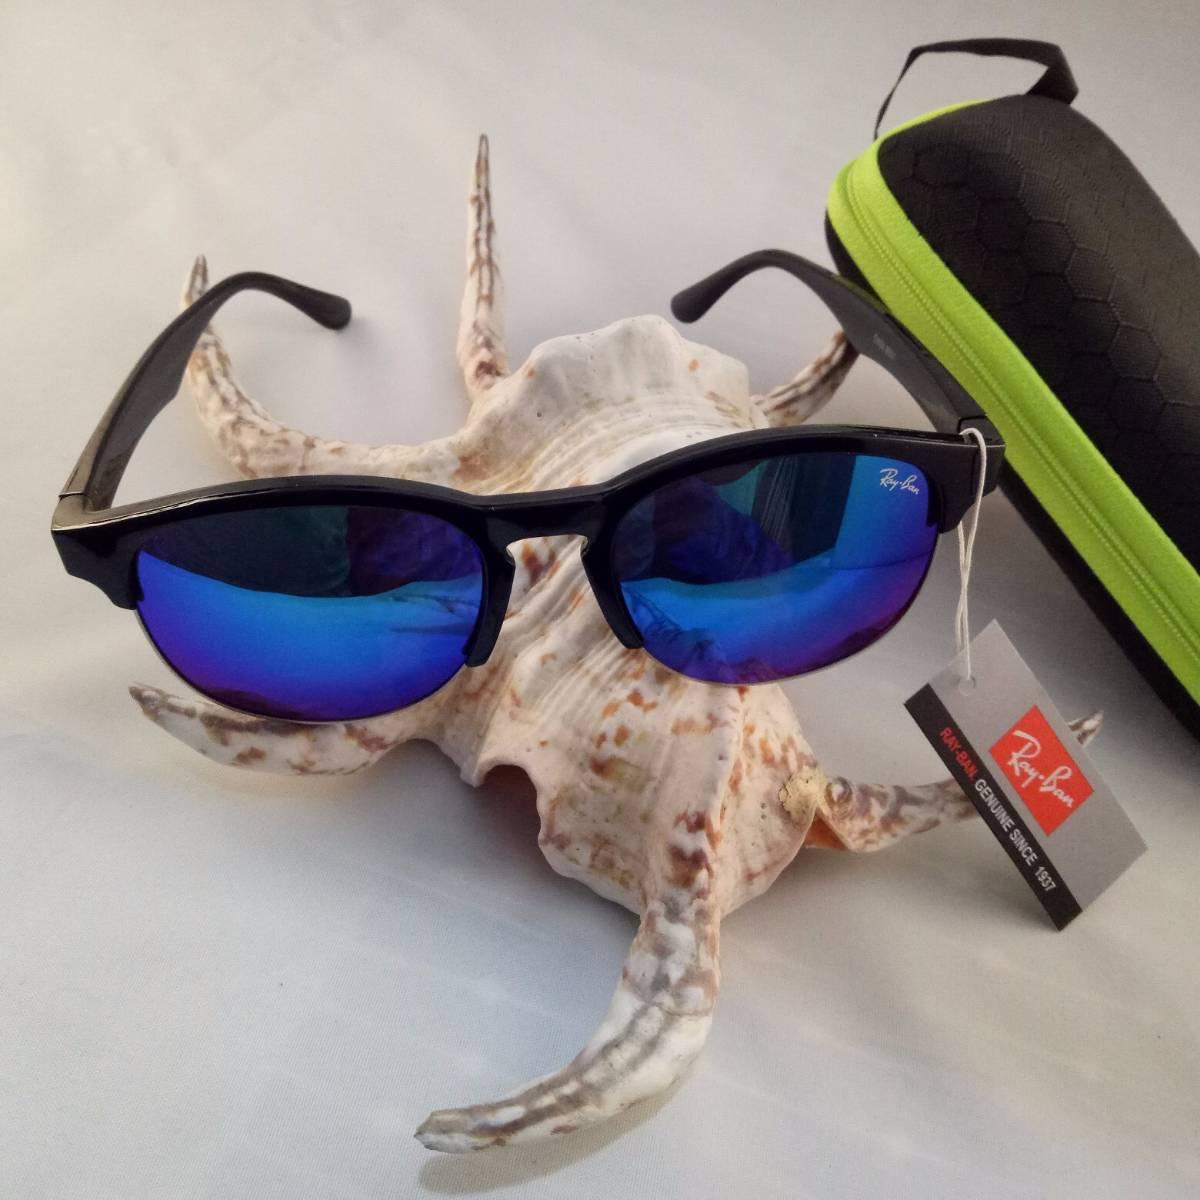 Kacamata Rayban F1 Light Blue